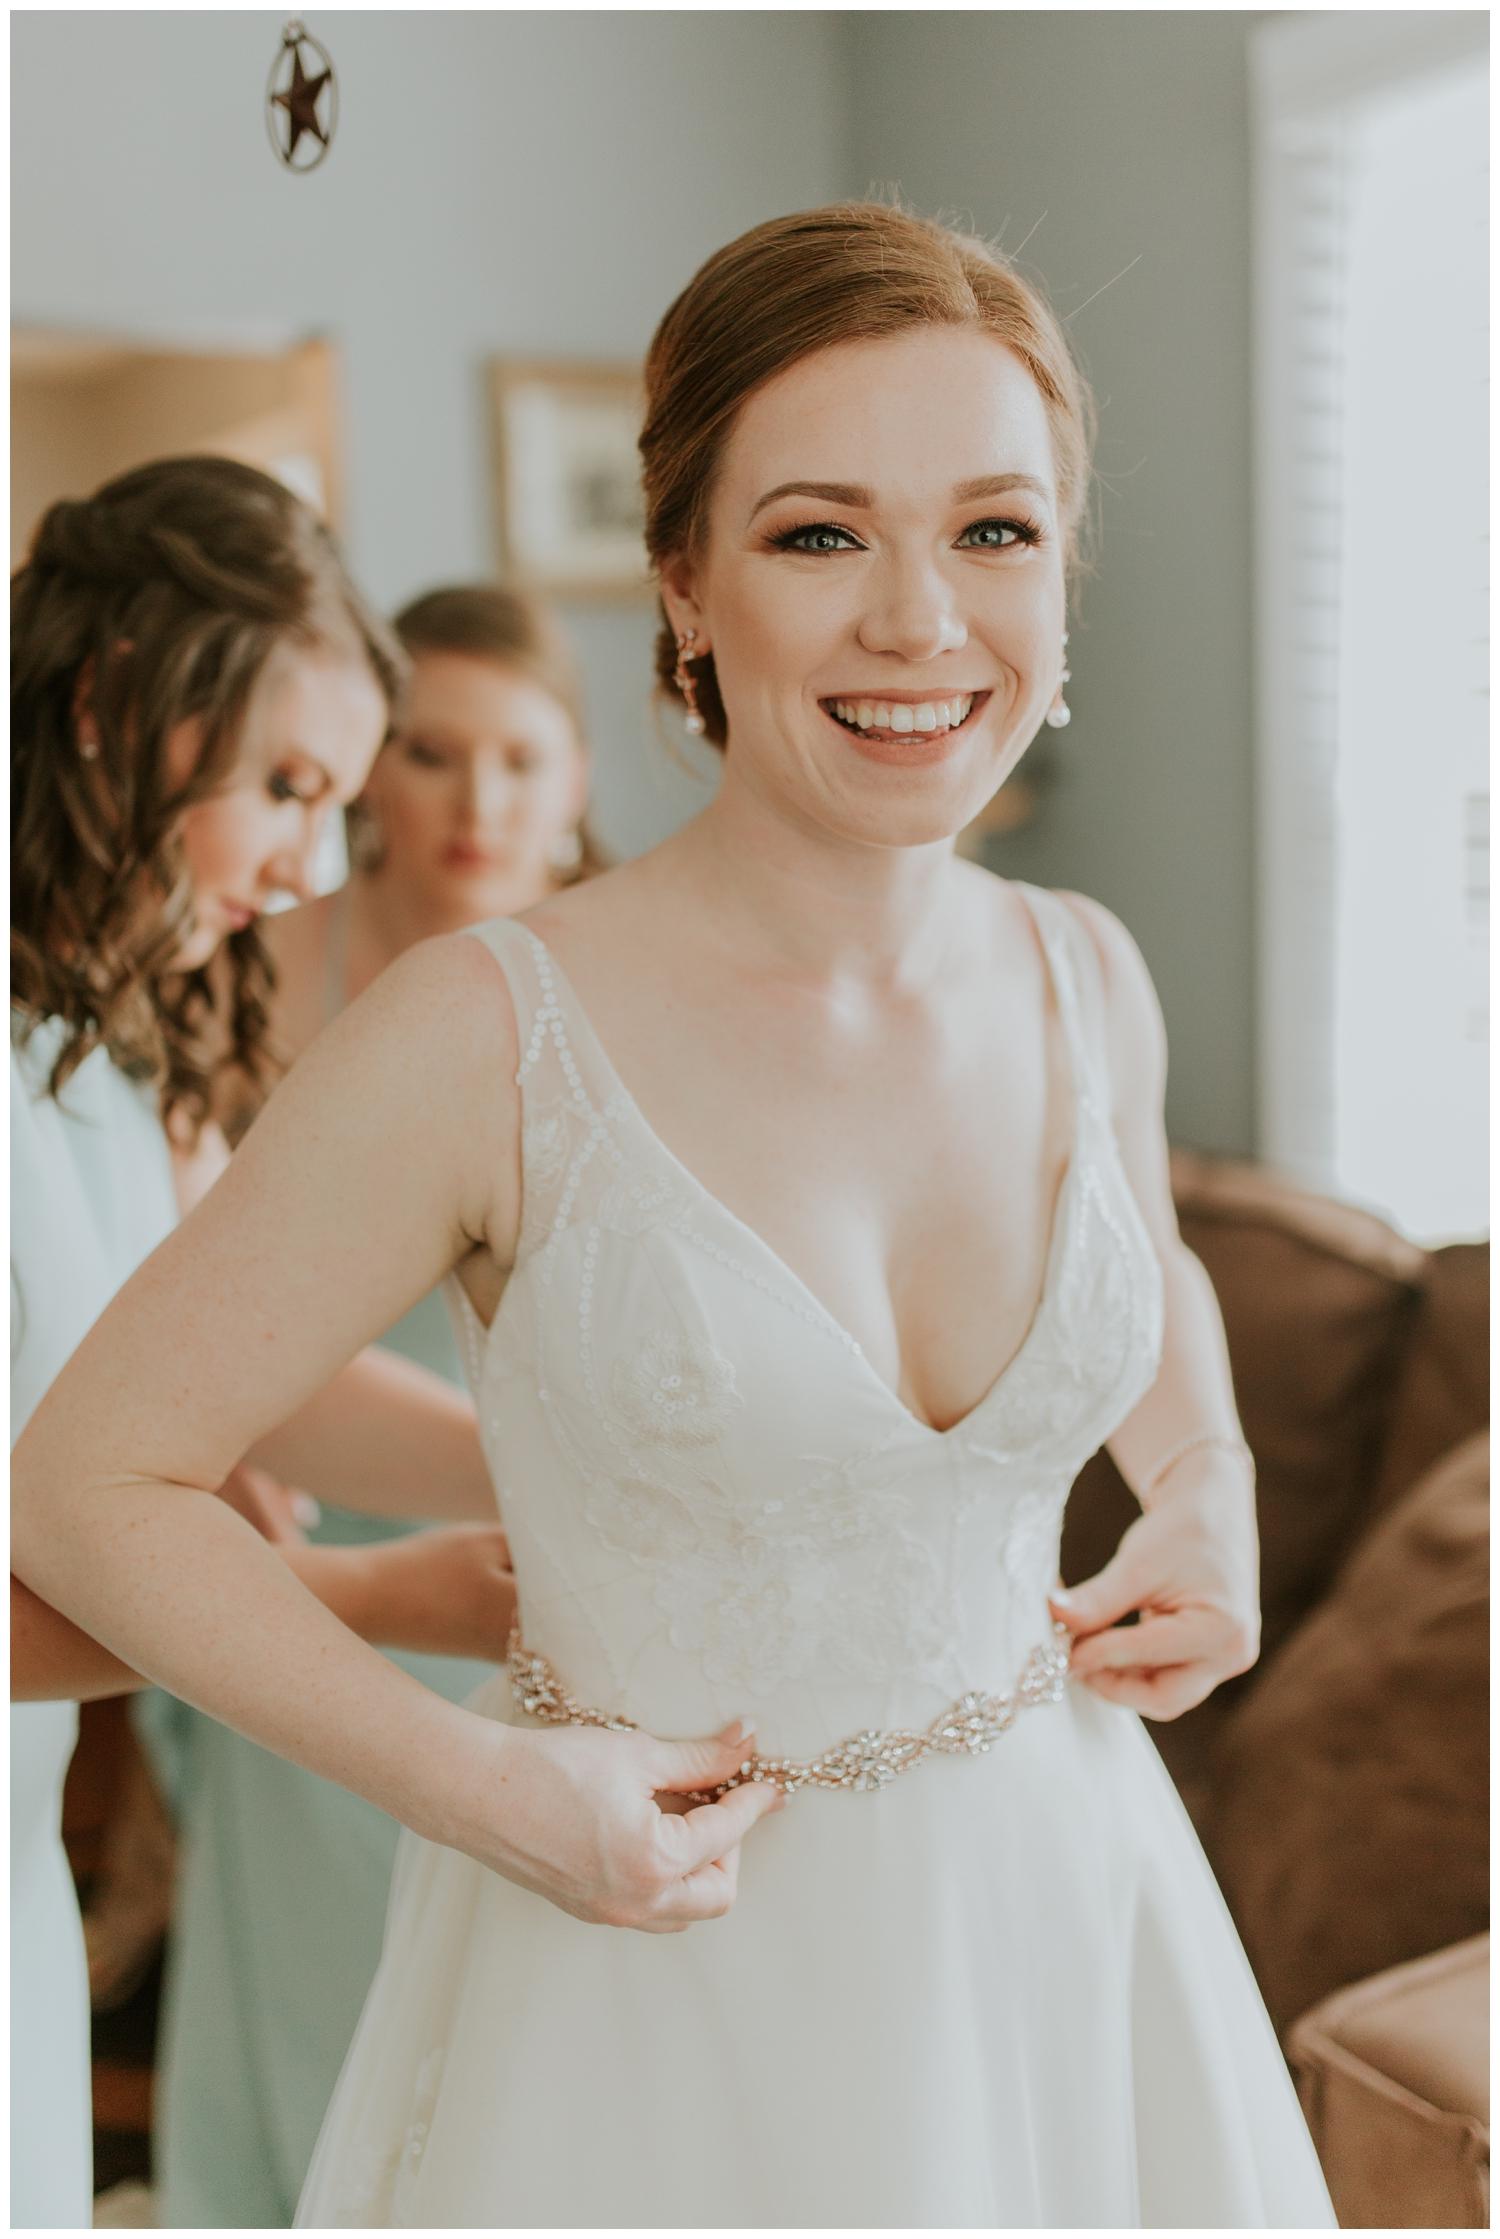 Jenna+Brandon, Mission Concepcion Wedding, San Antonio, Contista Productions Wedding Photography_0006.jpg